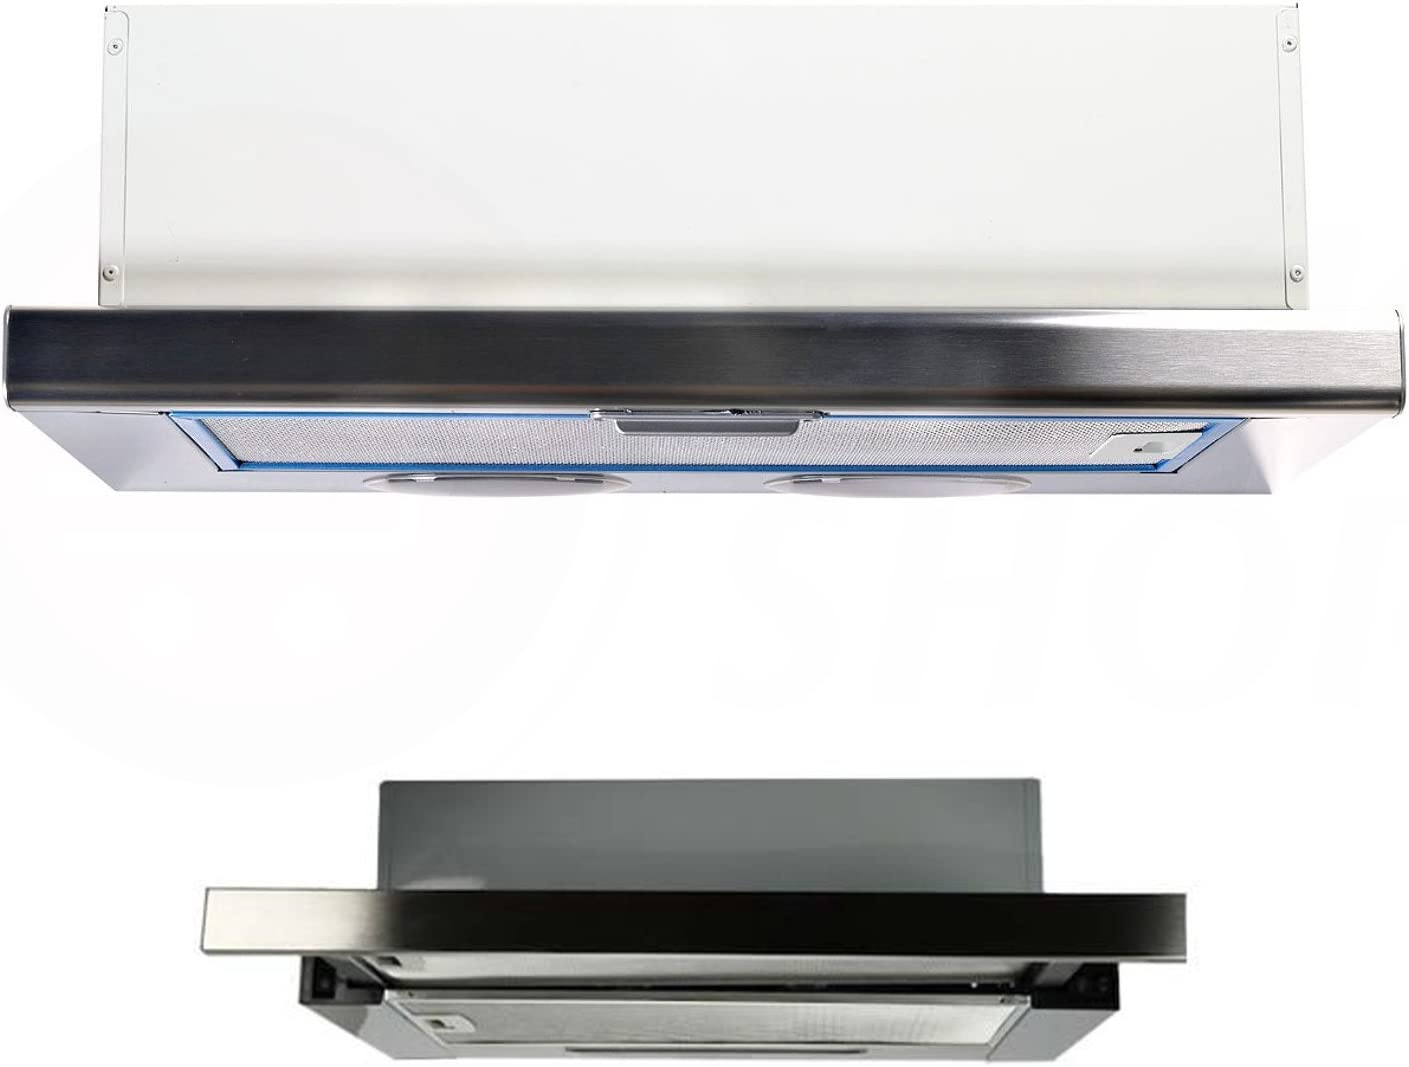 Cooker Hood Extractor Fan Wall Under Cabinet Flat Hood 600 X 180 X 285 White Amazon Co Uk Large Appliances